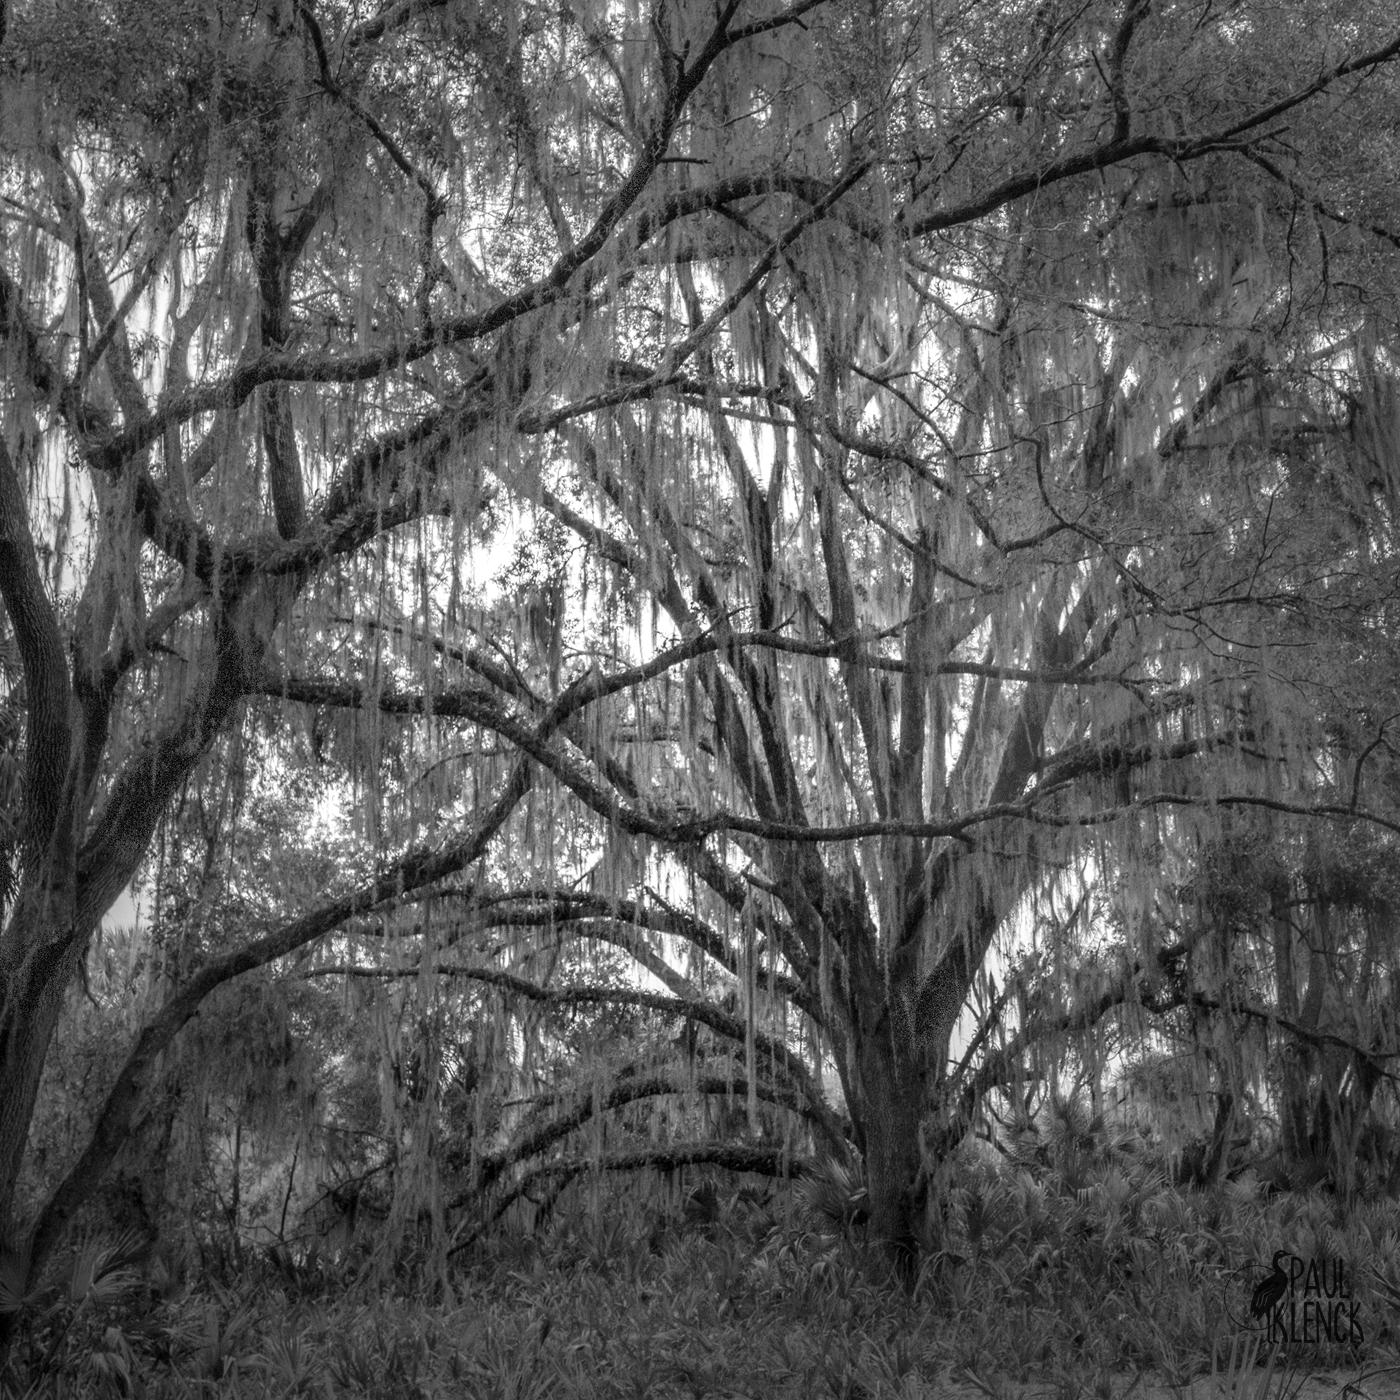 Oak, Paynes Prairie Preserve State Park, Florida